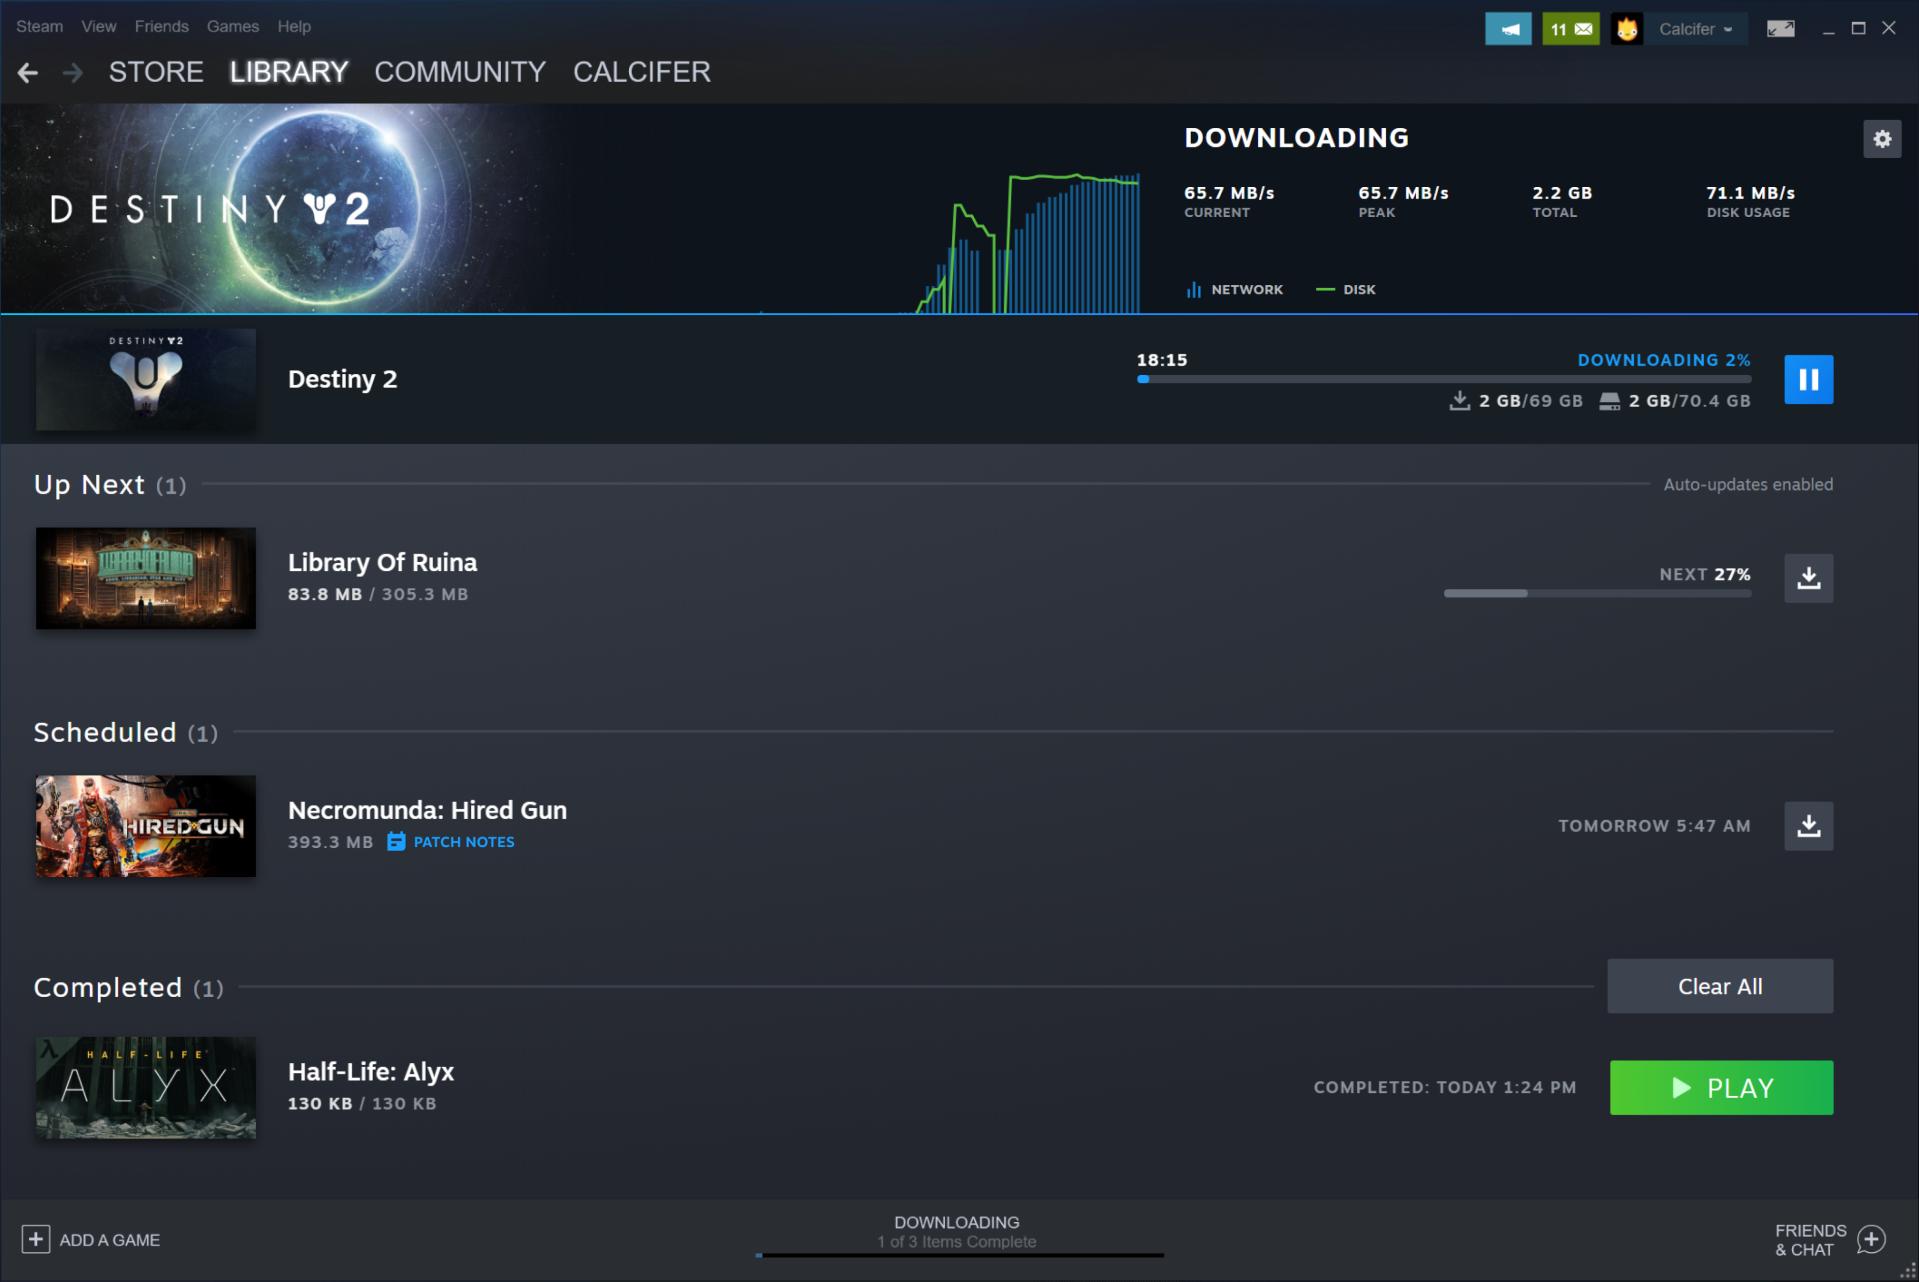 Steam客户端更新下载页面 硬盘空间管理更加轻松插图1